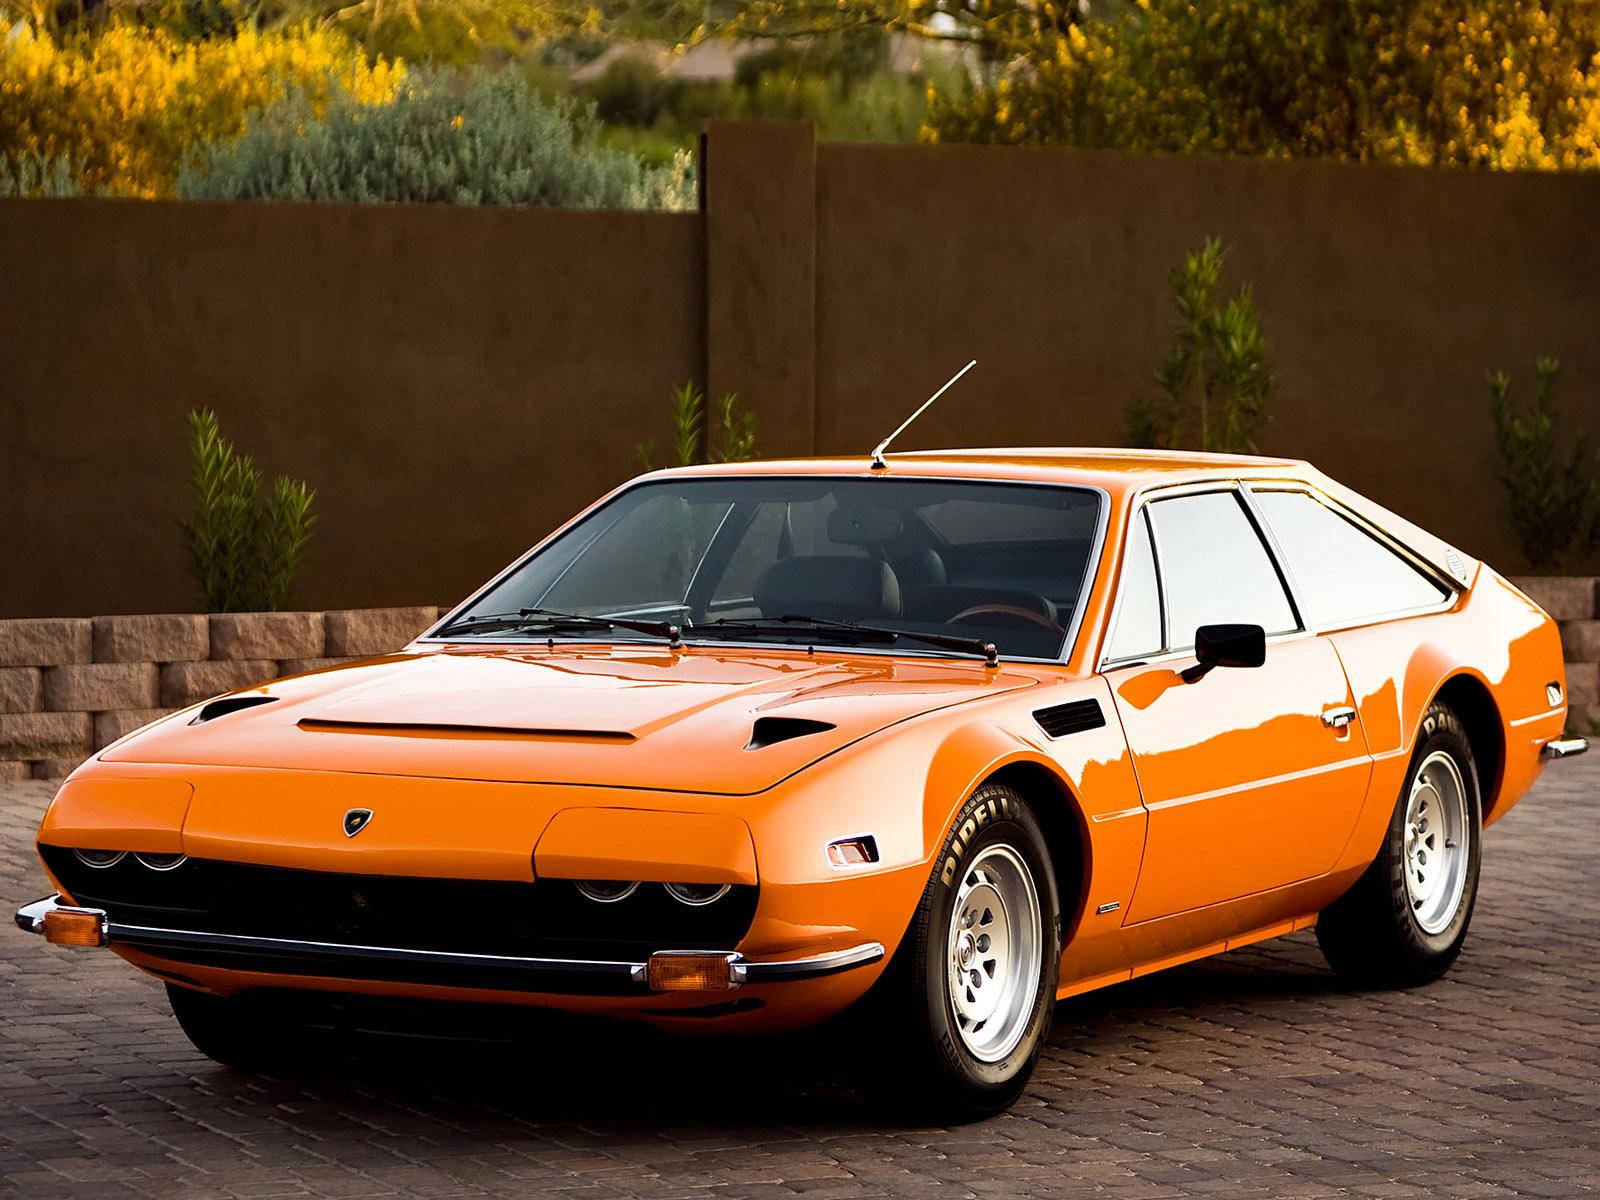 HQ Lamborghini Jarama Wallpapers | File 375.85Kb